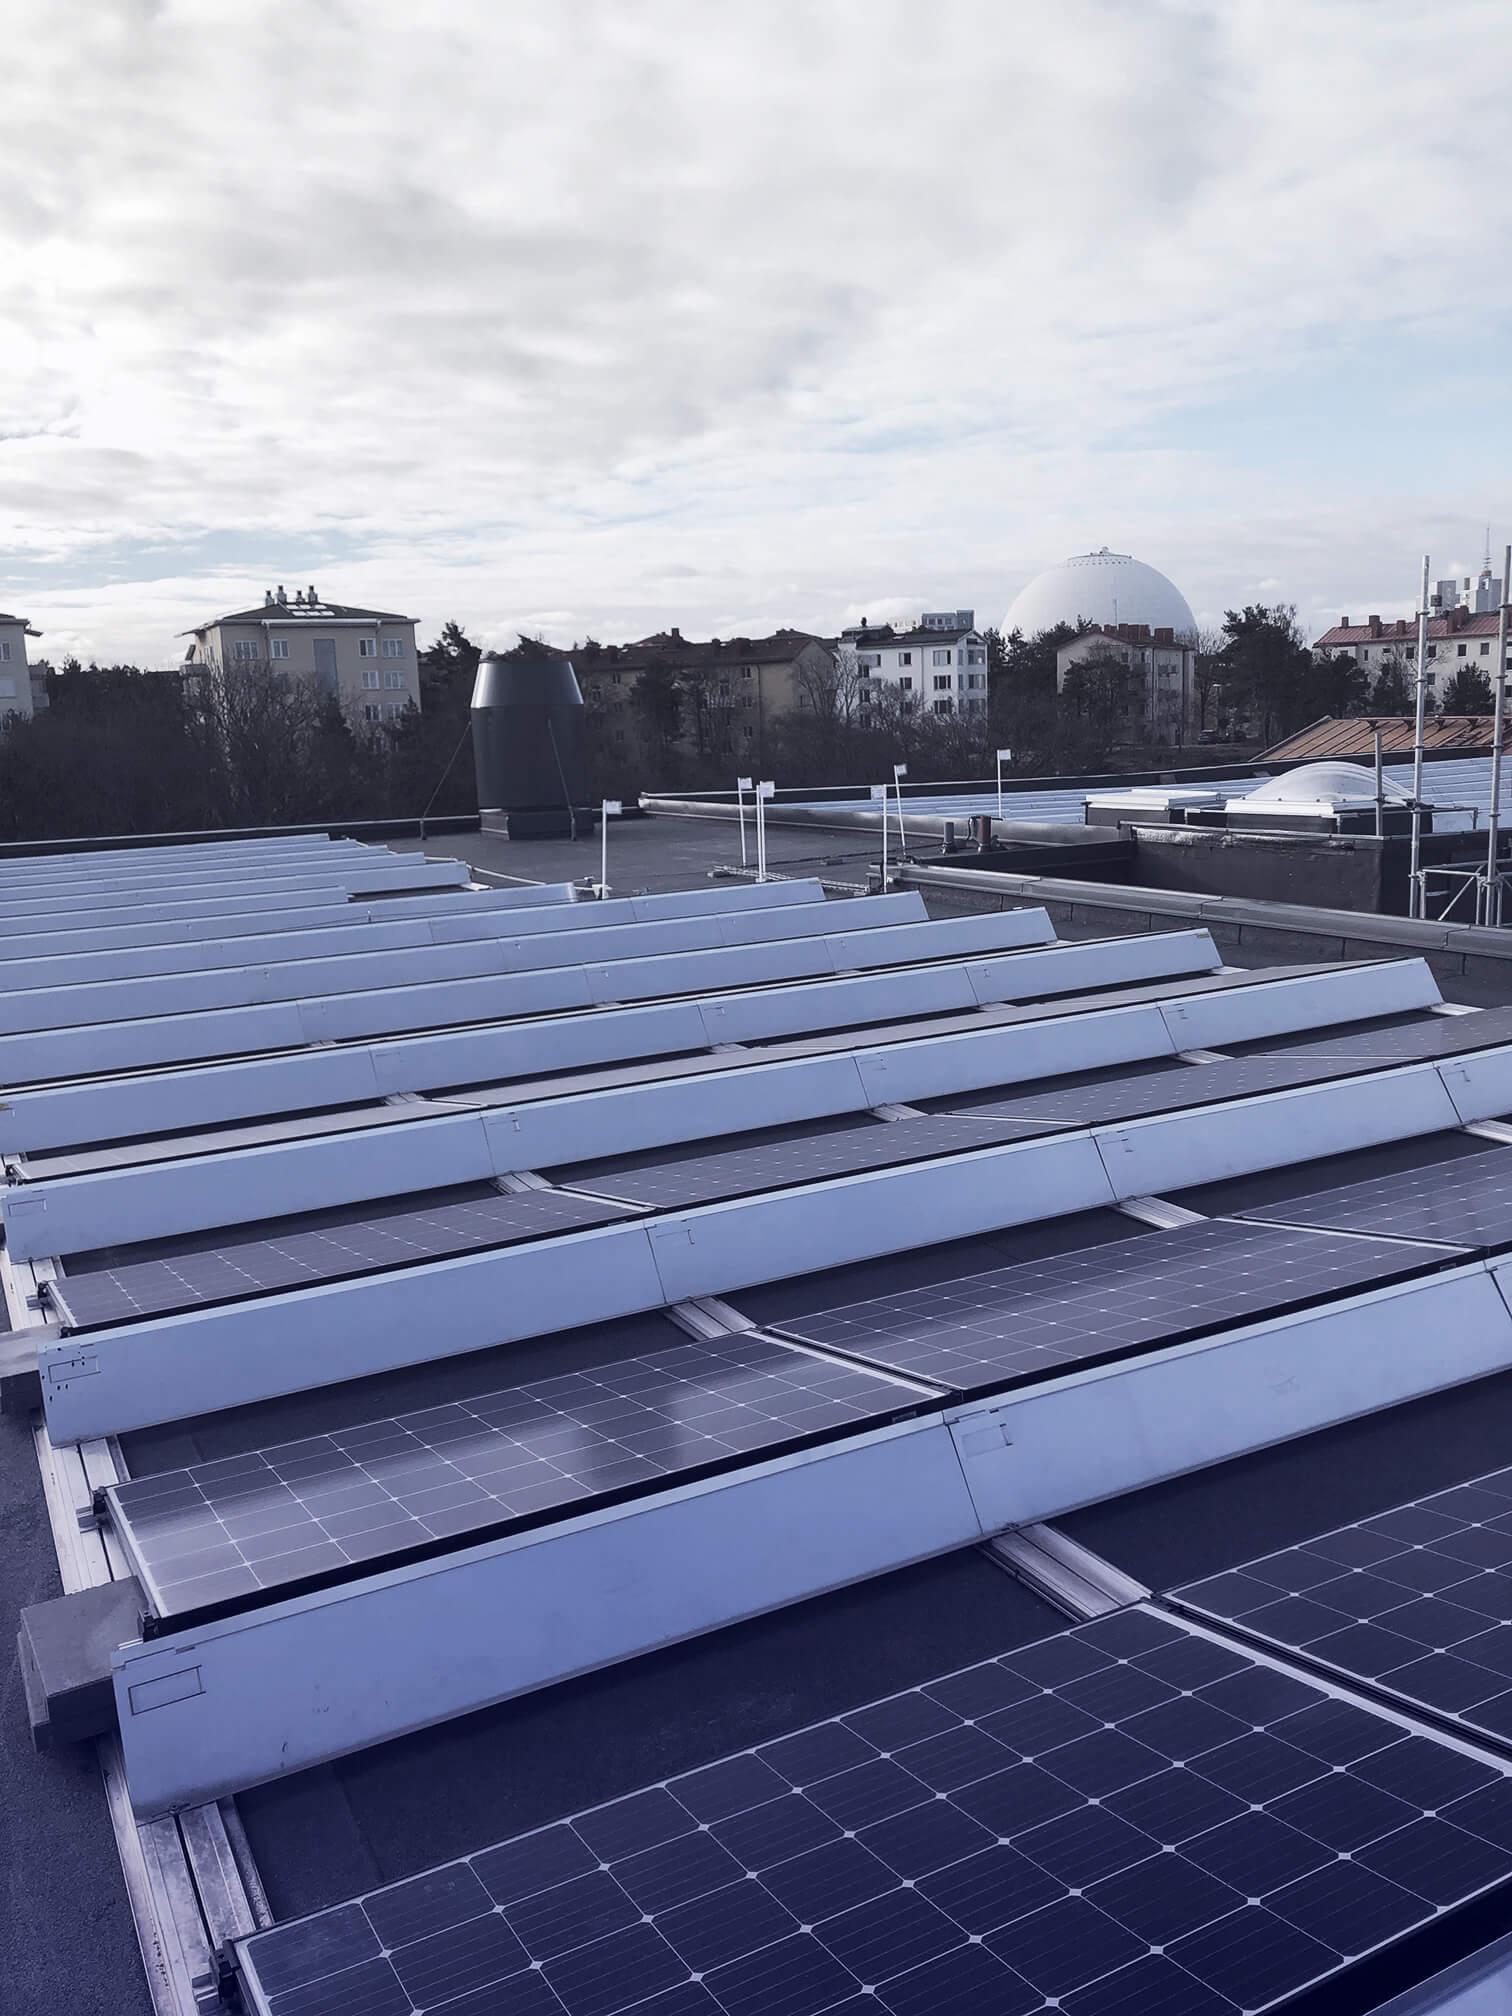 Solceller på tak med utsikt över Globen, Stockholm.